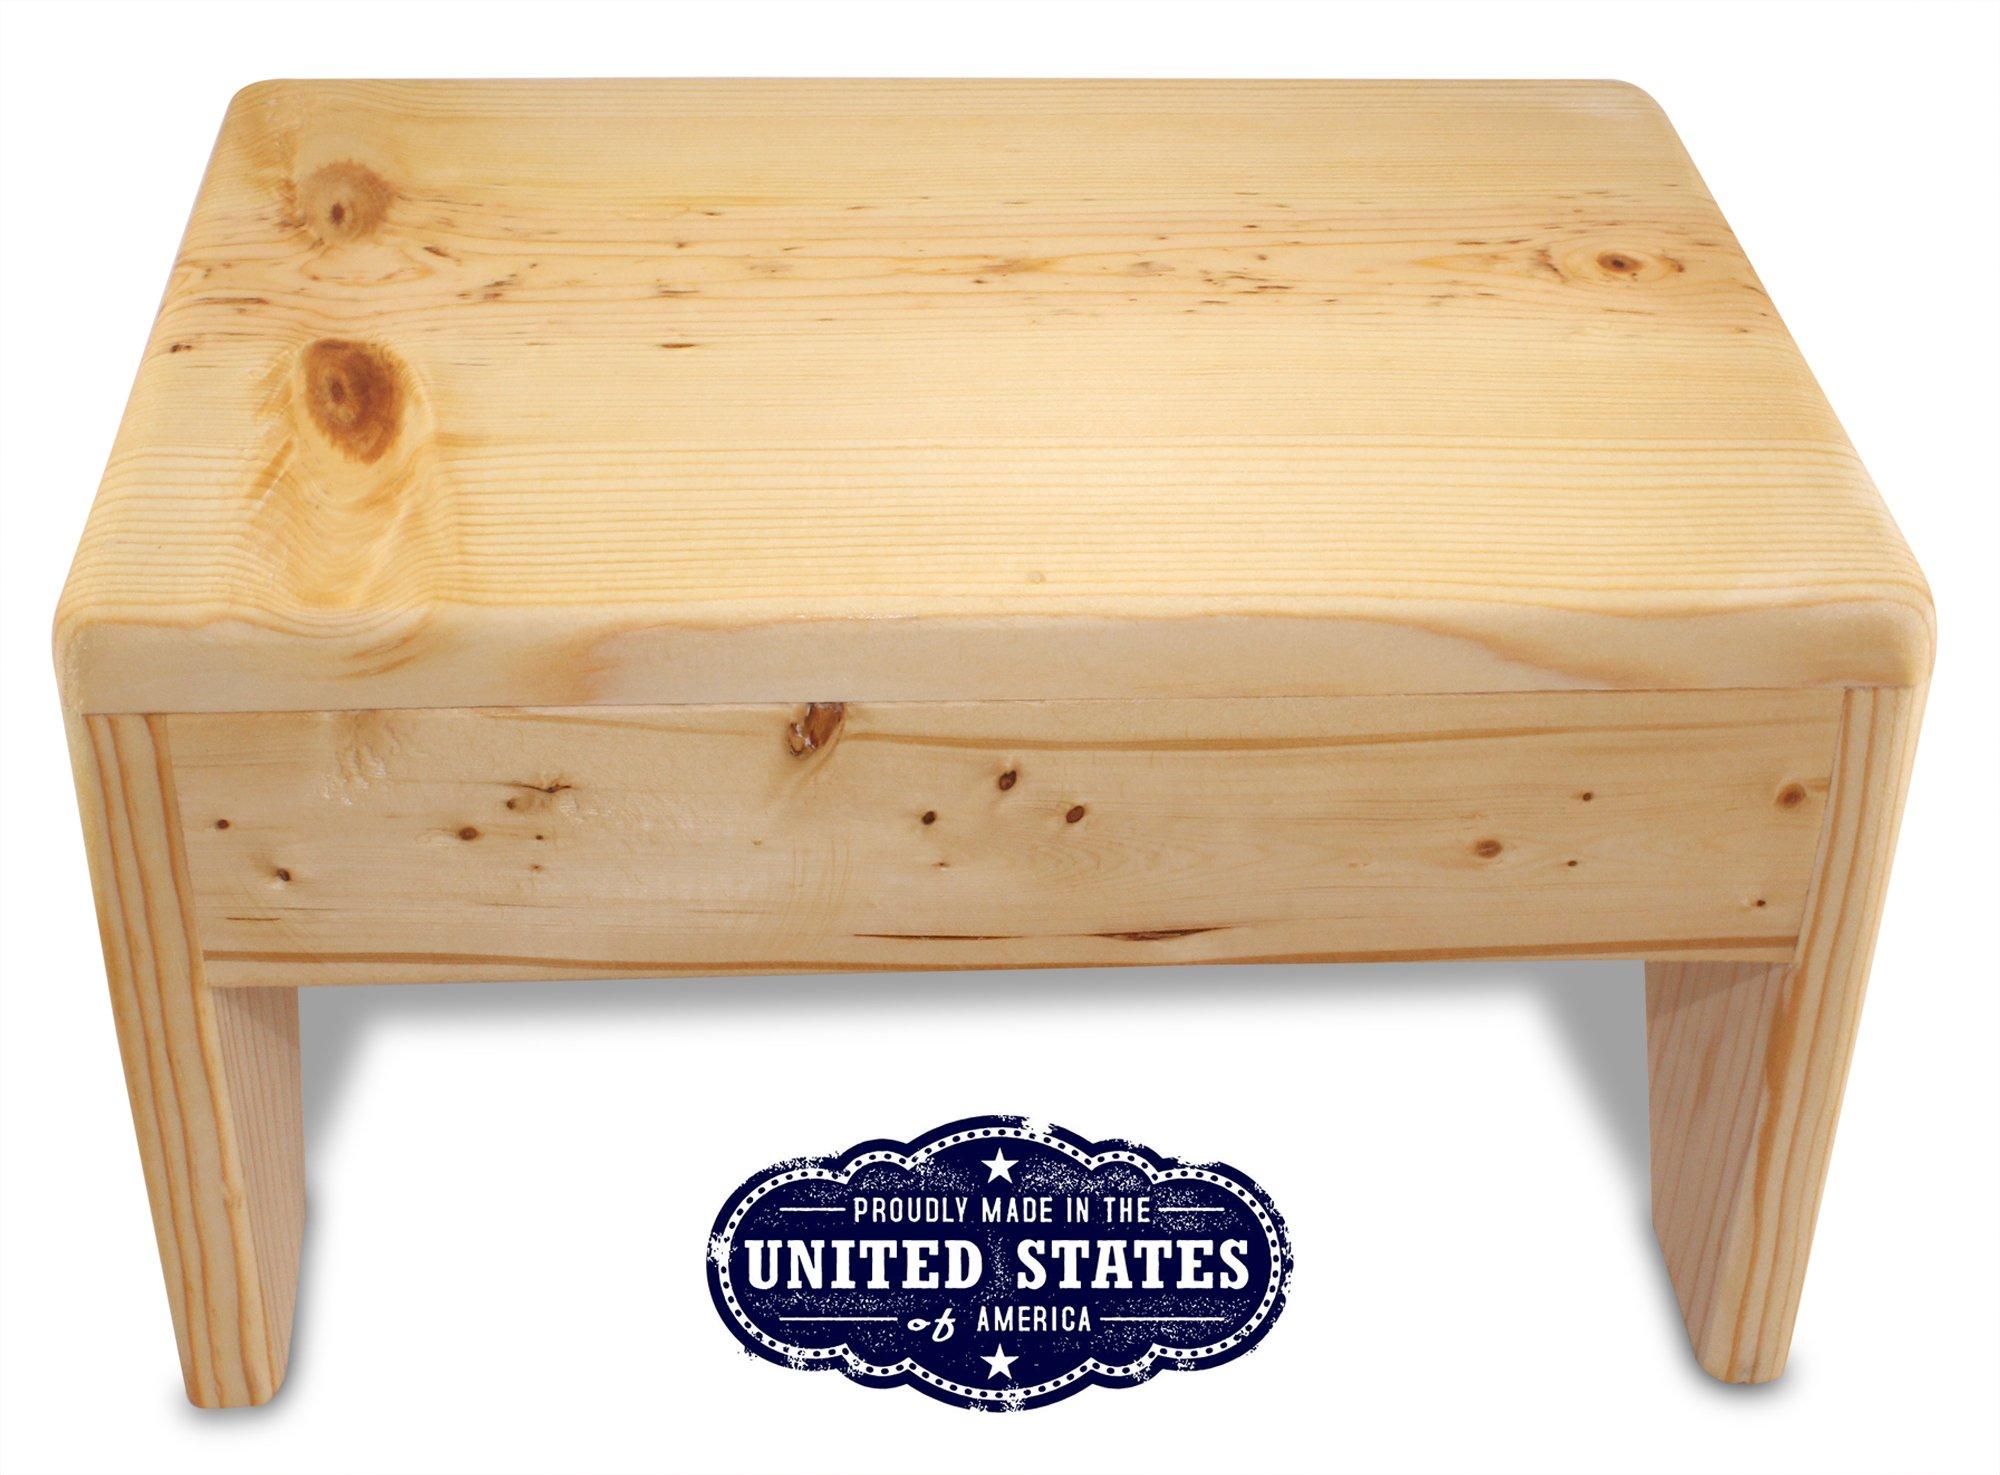 cutestepstools 8 Inch Solid Wood Step Stool by www.cutstepstools.com (Image #1)